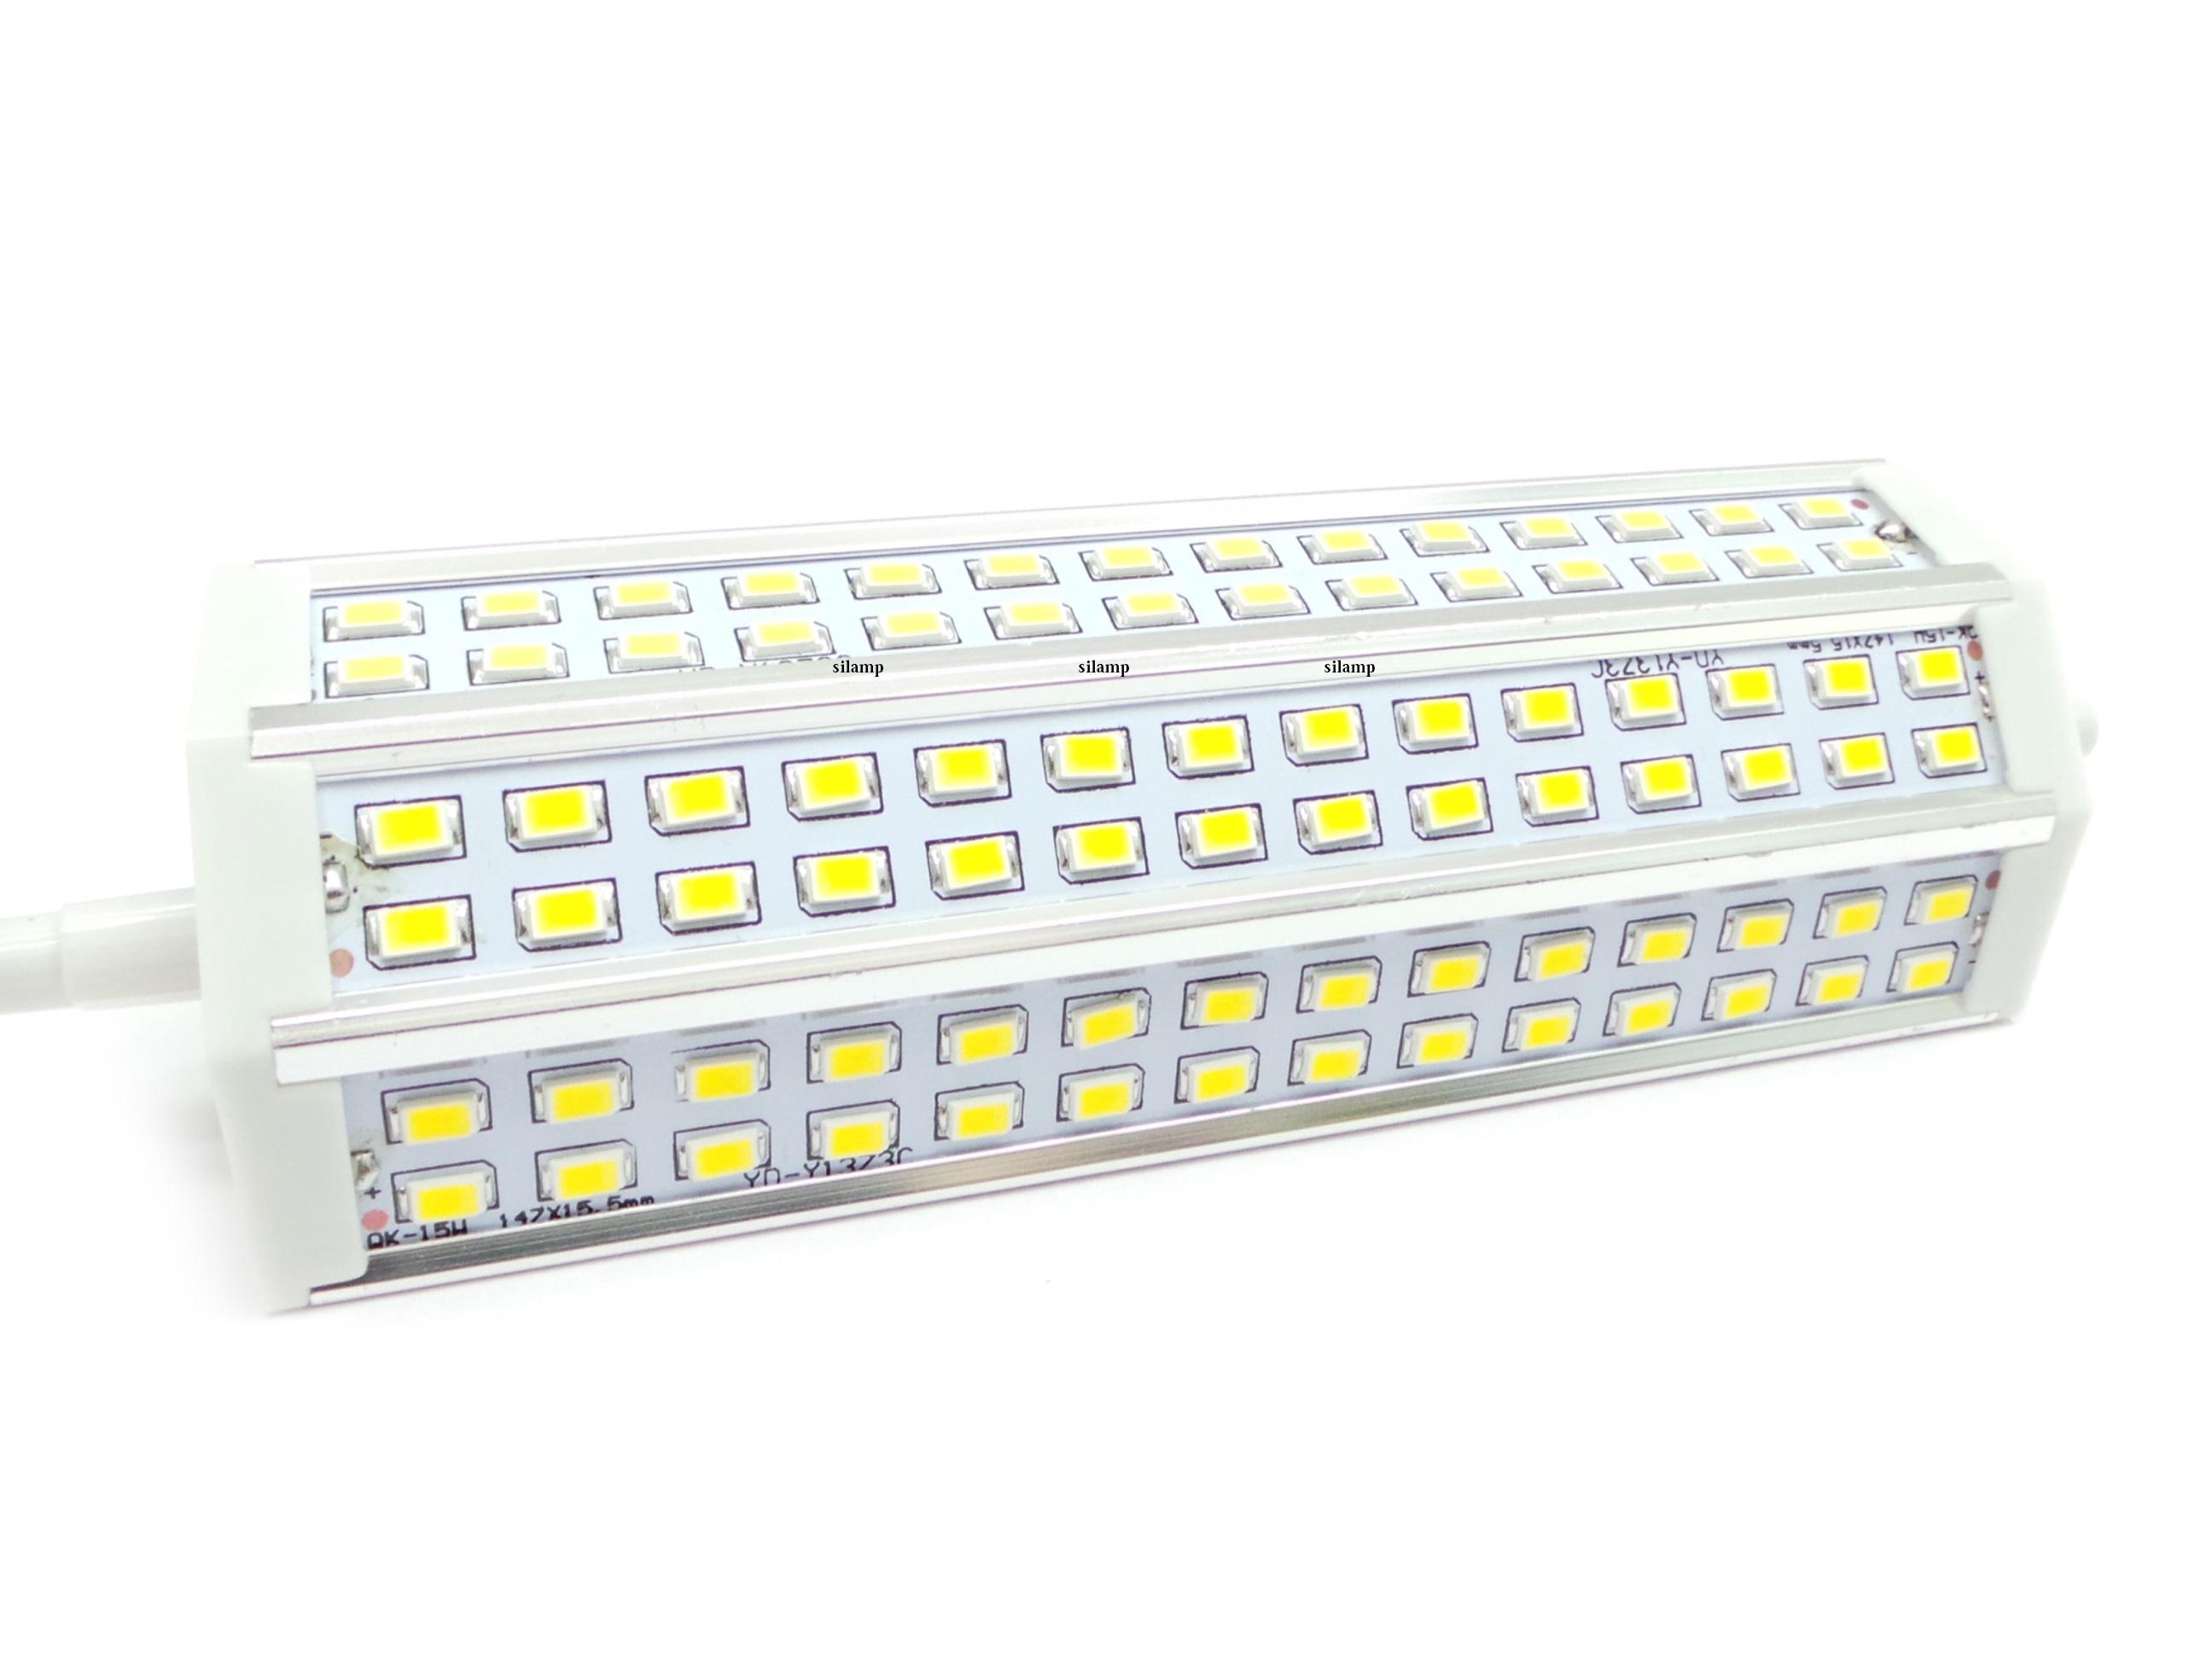 L4 r7s15w offerte lampadine led silamp lampadina for Offerte lampadine led